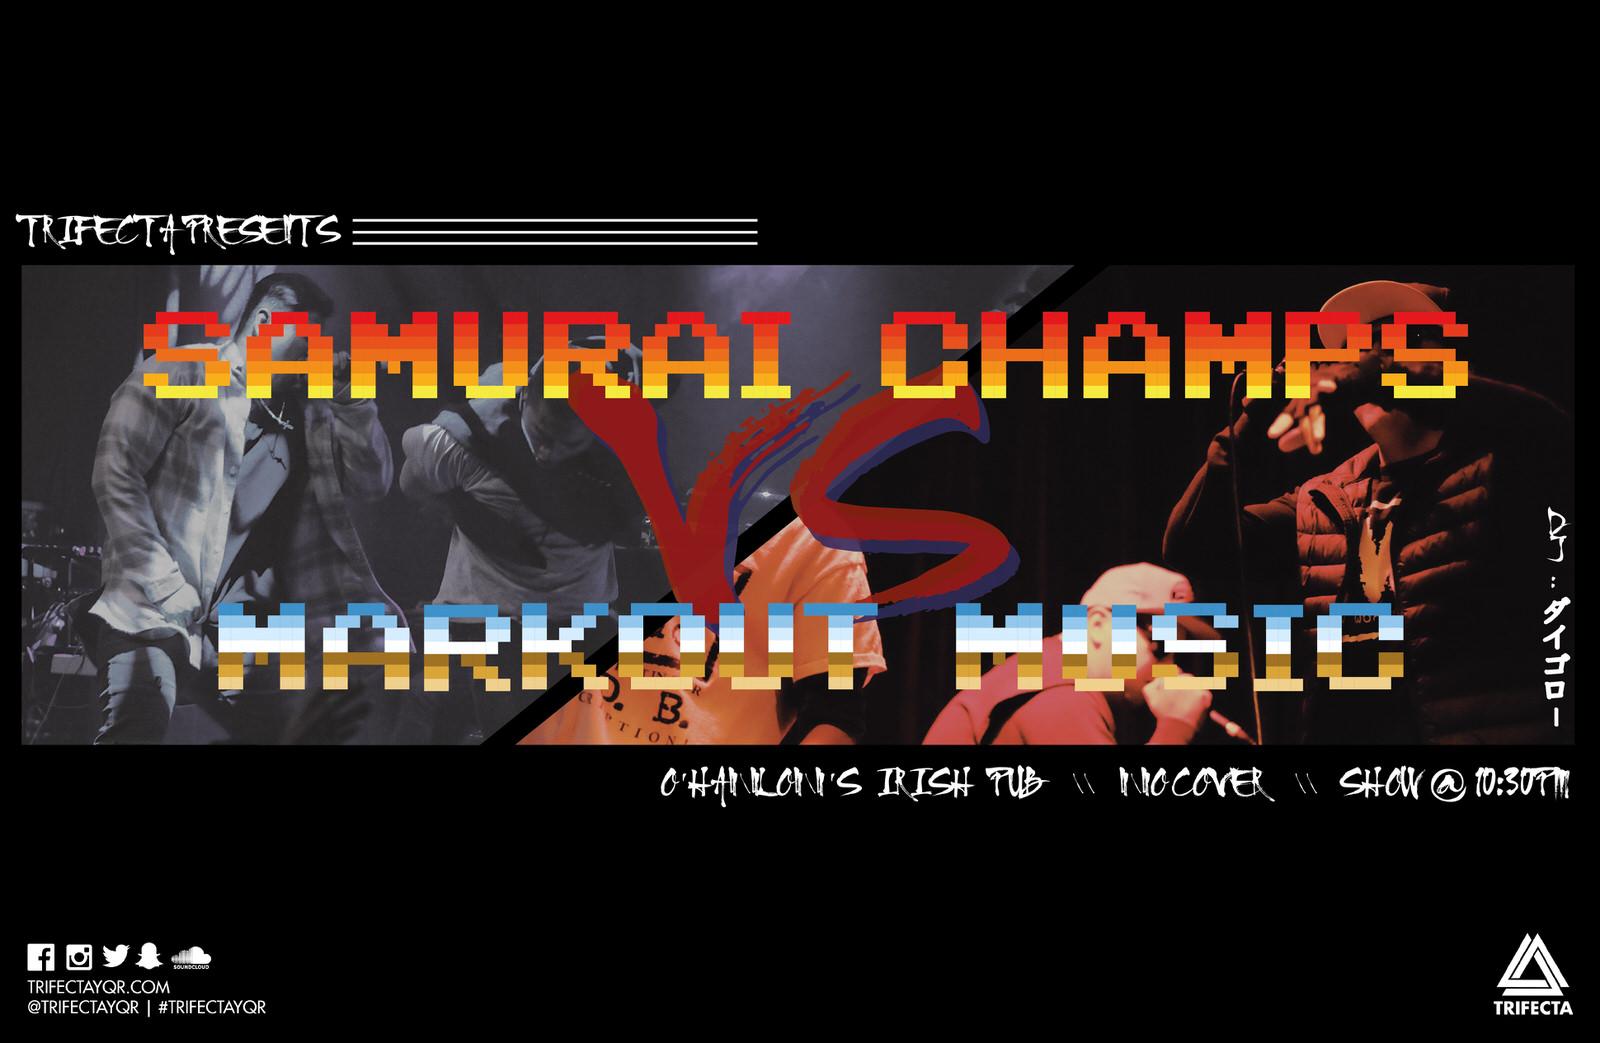 Samurai Champs vs Markout Music-01 copy.jpg